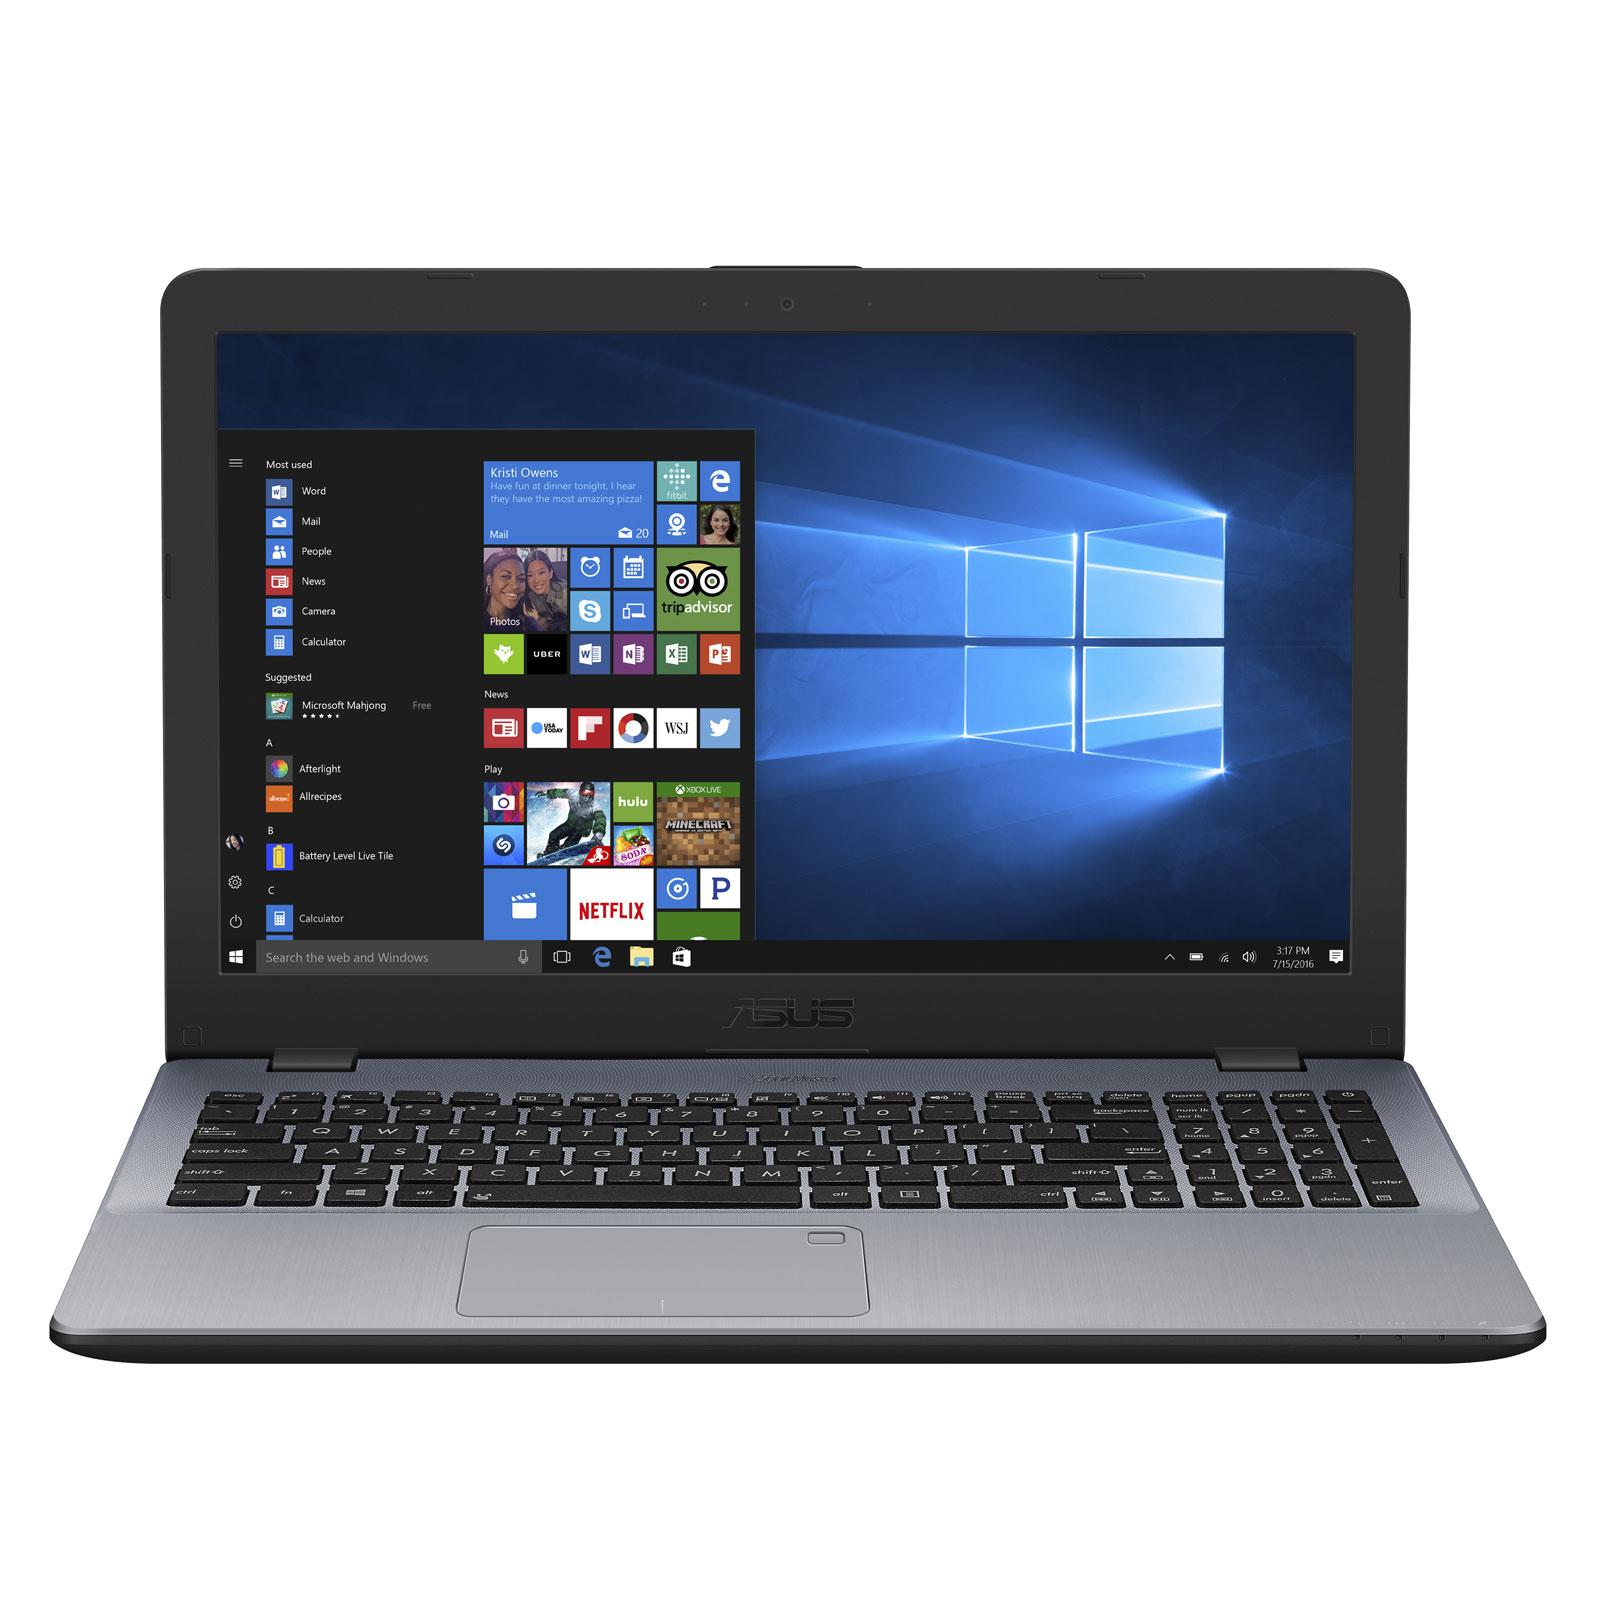 P1501UA-DM598R (90NB0F22-M08100) - Achat / Vente PC portable sur Picata.fr - 0